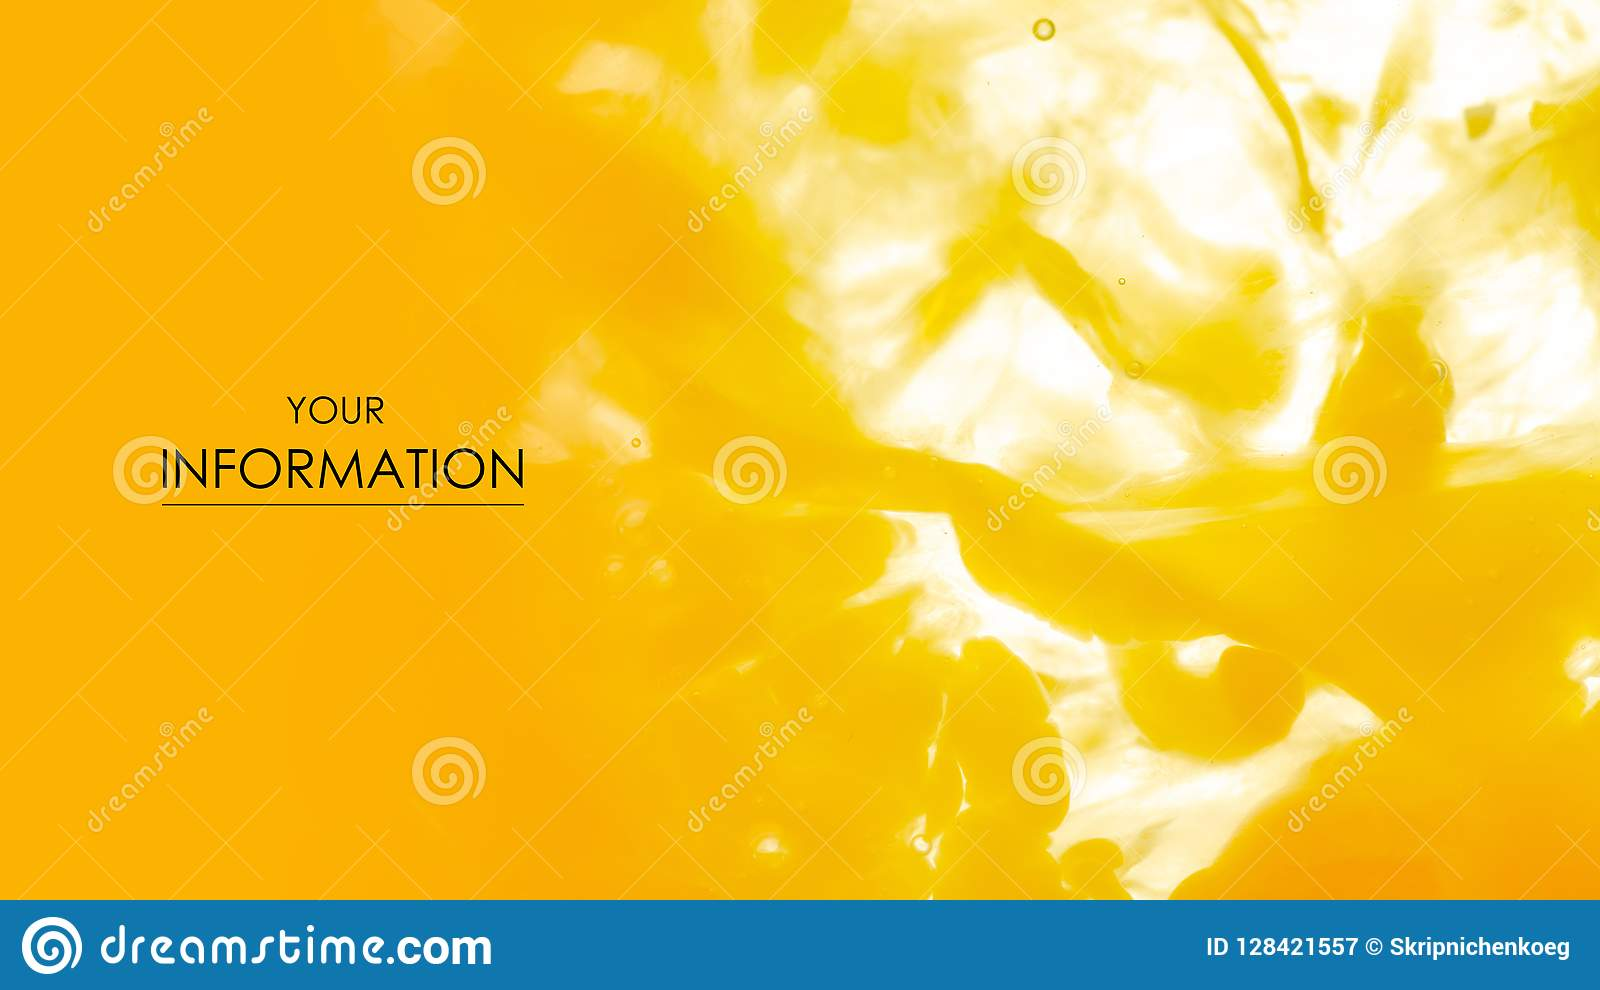 Makrolebensmittelmuster des gelb-orangeen Eigelbs